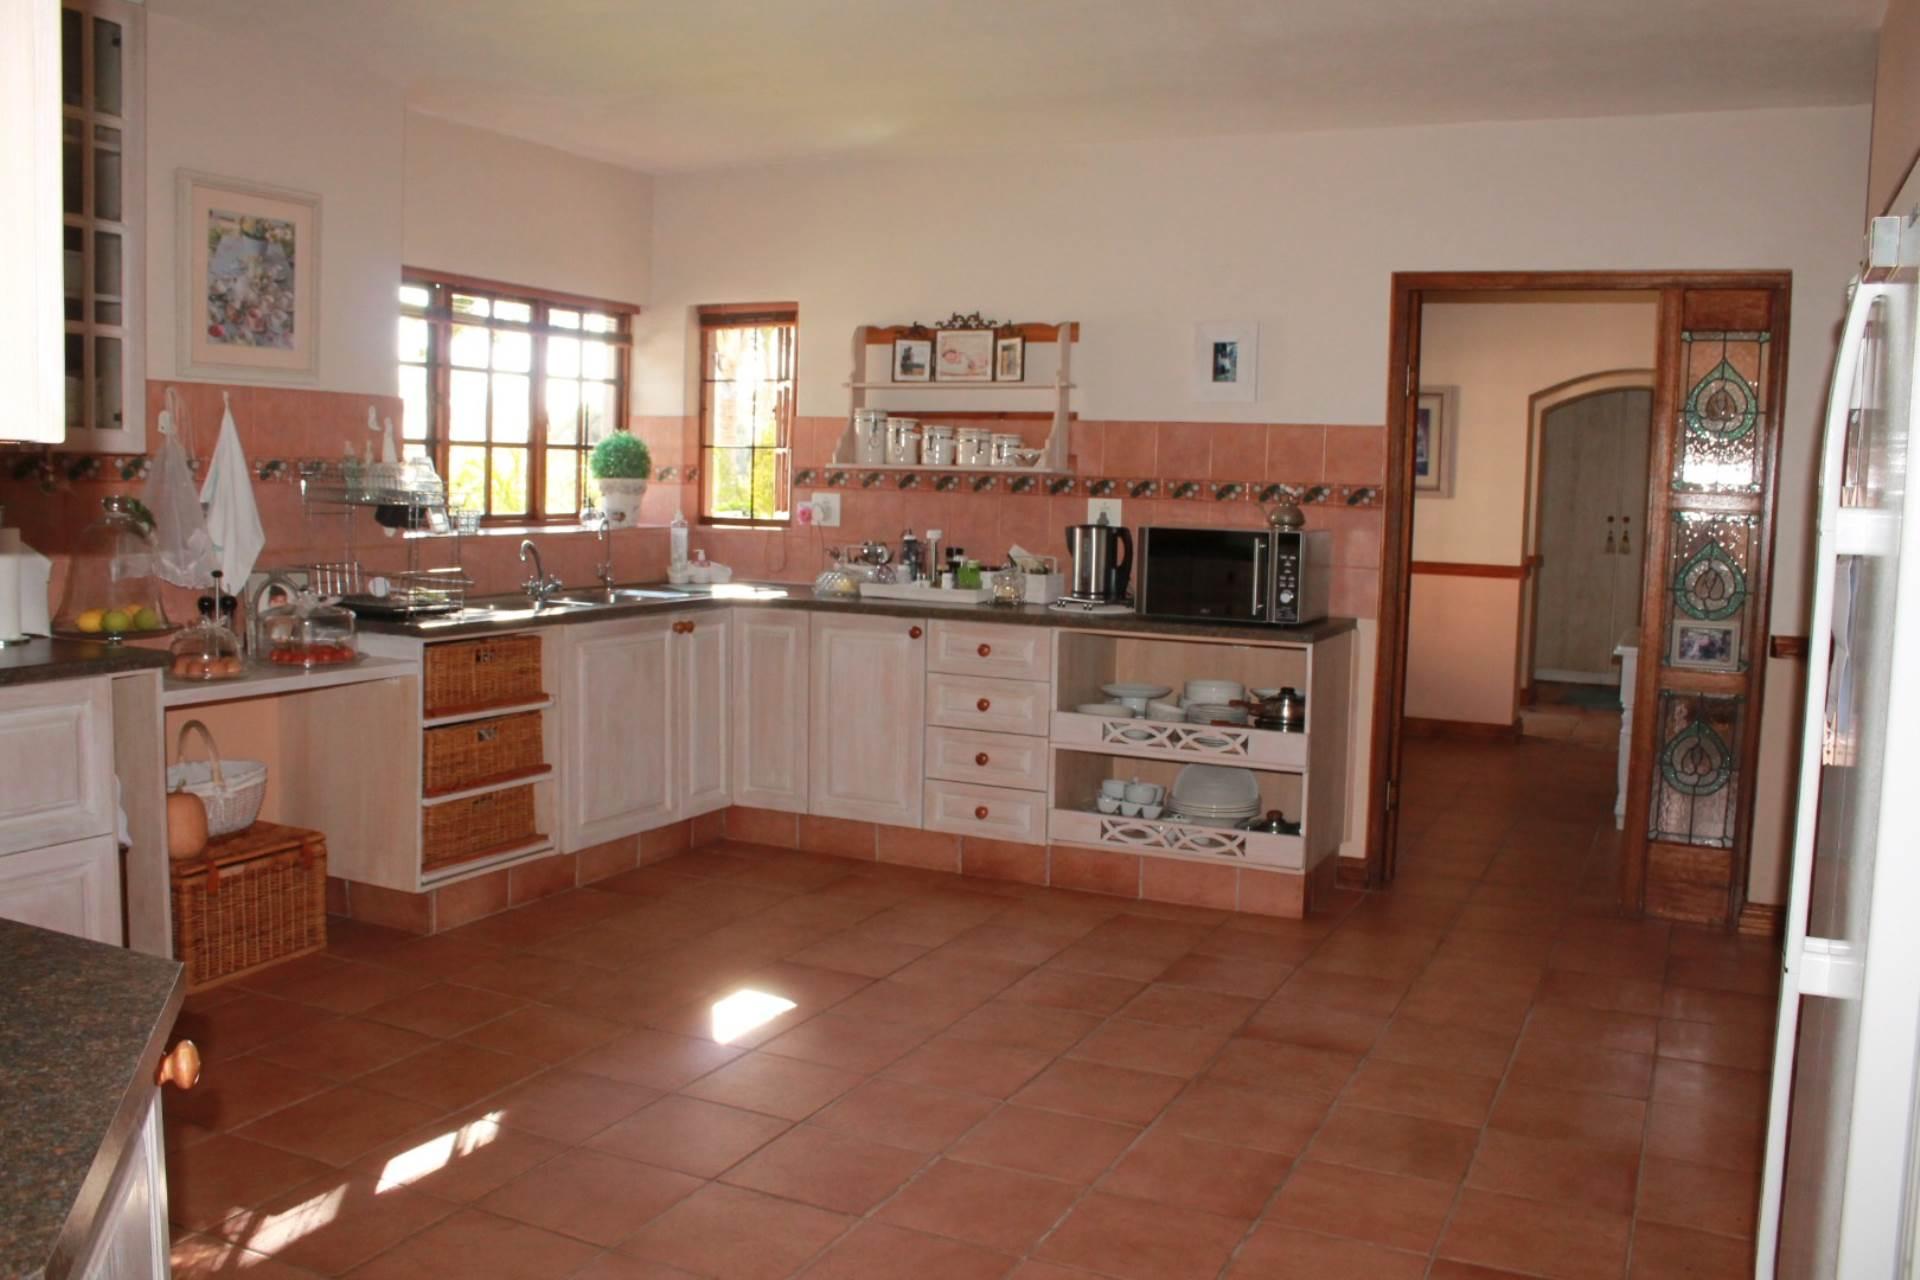 Akasia, Ninapark Property  | Houses For Sale Ninapark, NINAPARK, House 6 bedrooms property for sale Price:2,740,000